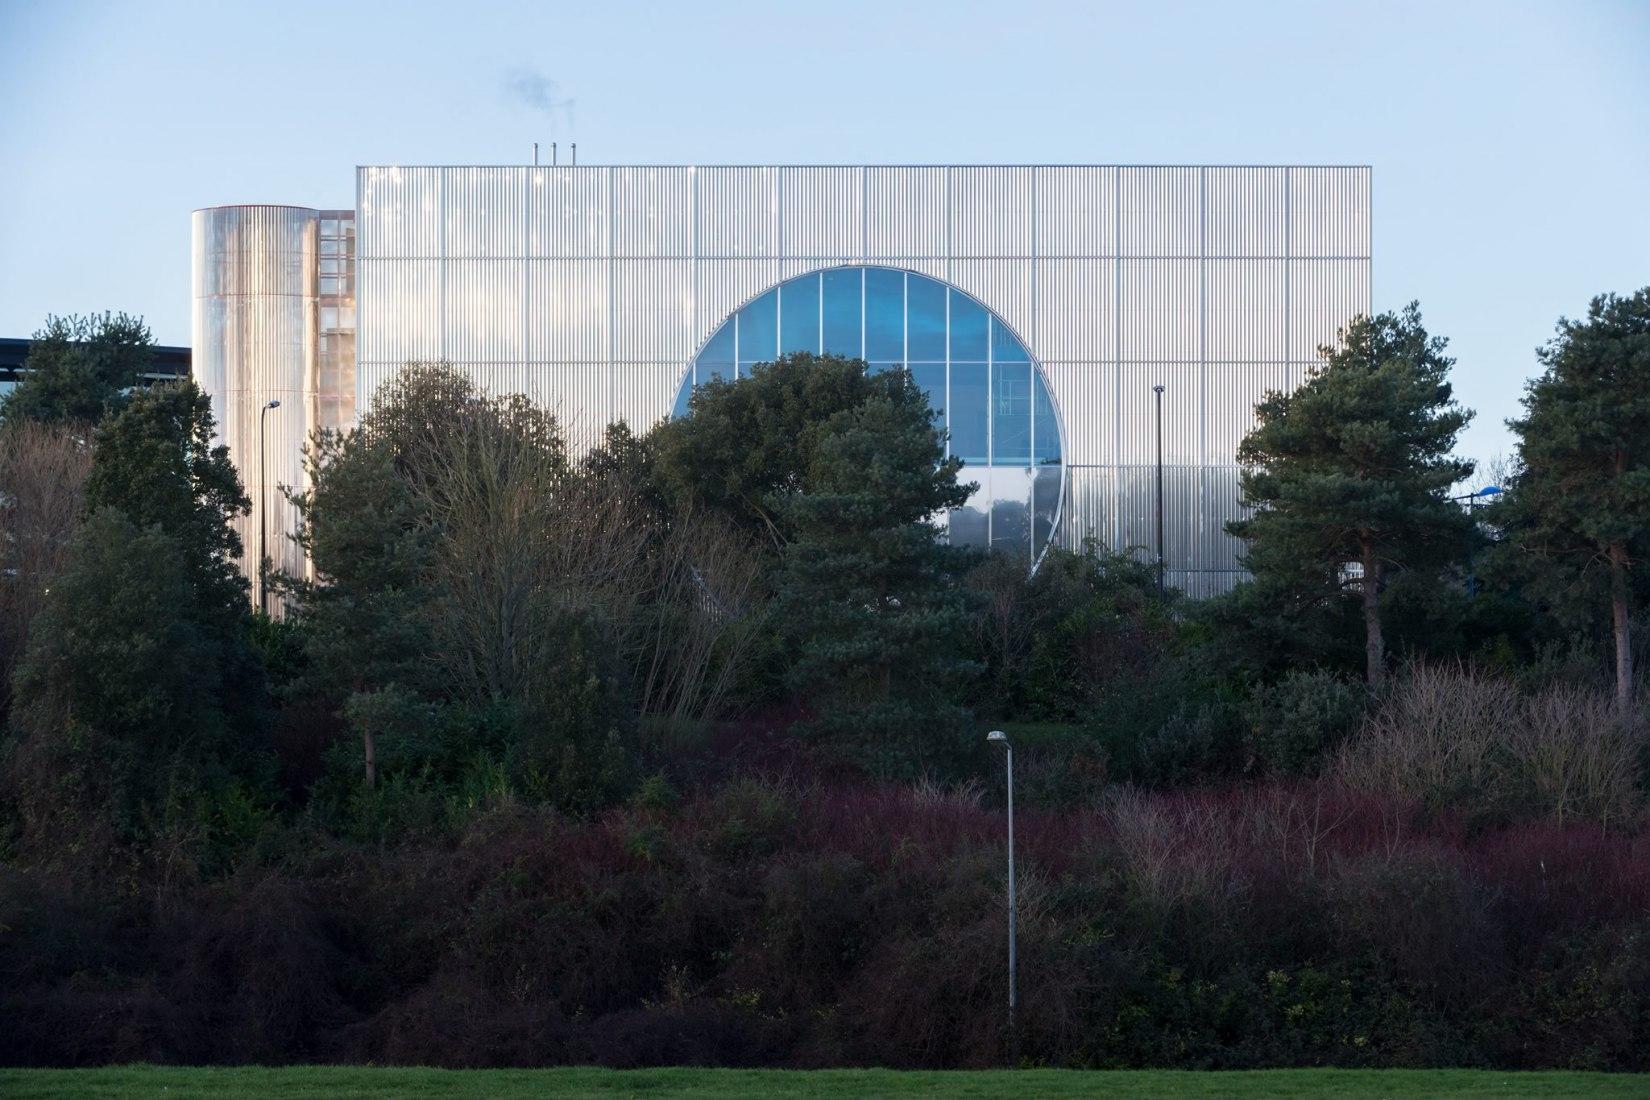 MK Gallery por 6a architects. Fotografía por Johan Dehlin.